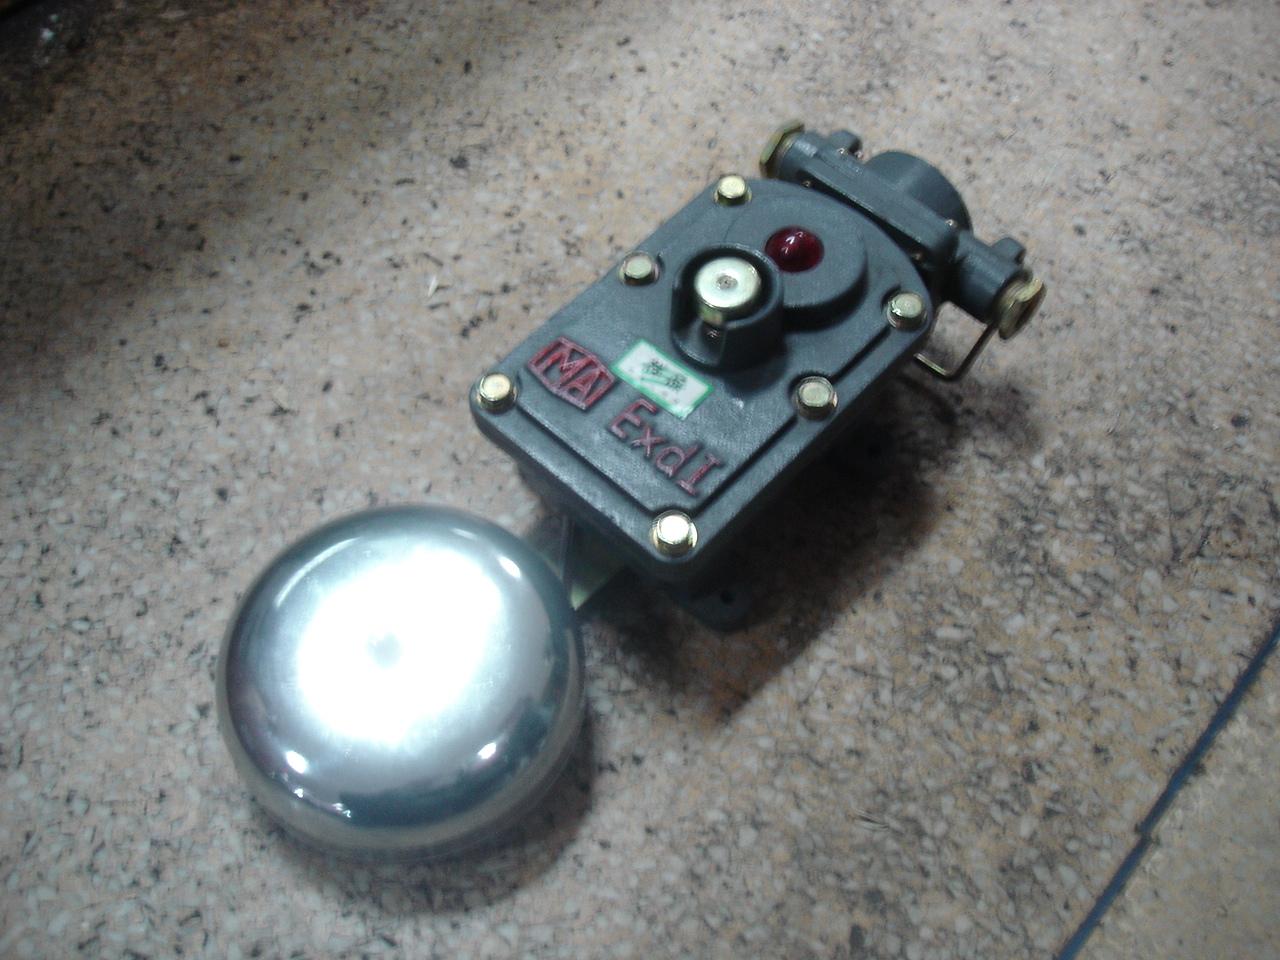 BZL2 127 36防爆声光组合电铃